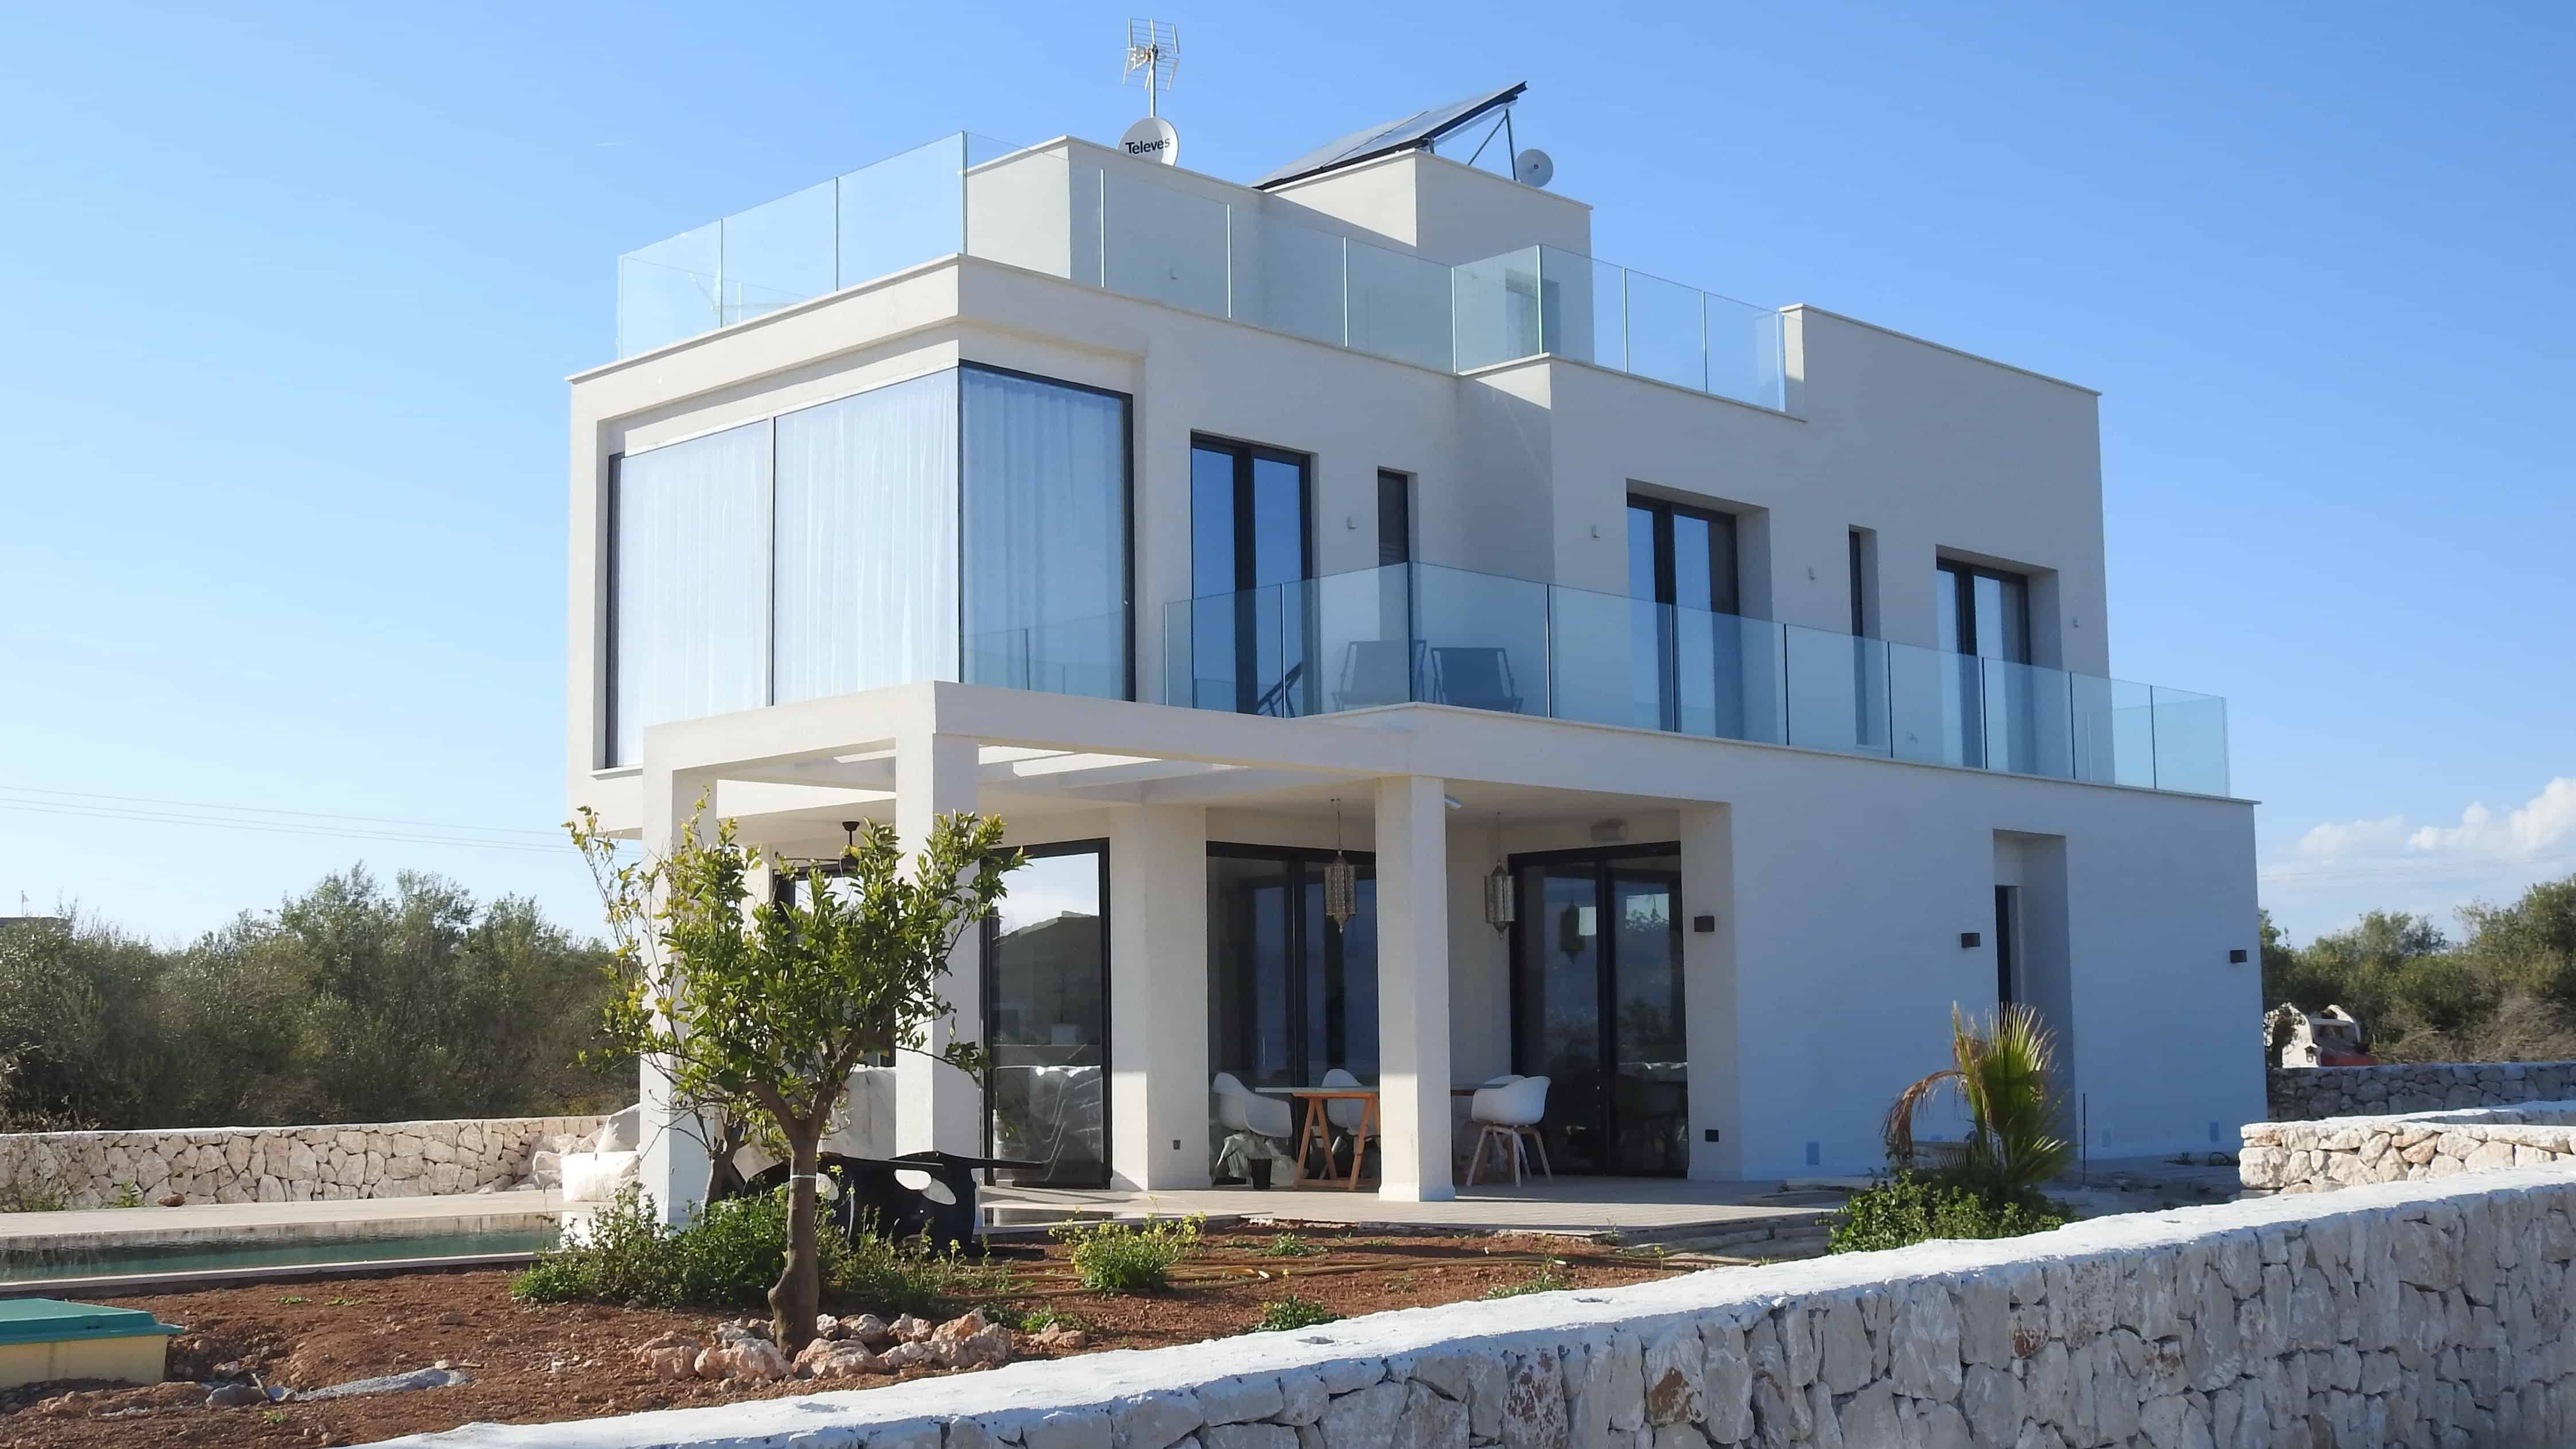 Architecture Balcony Building 534182